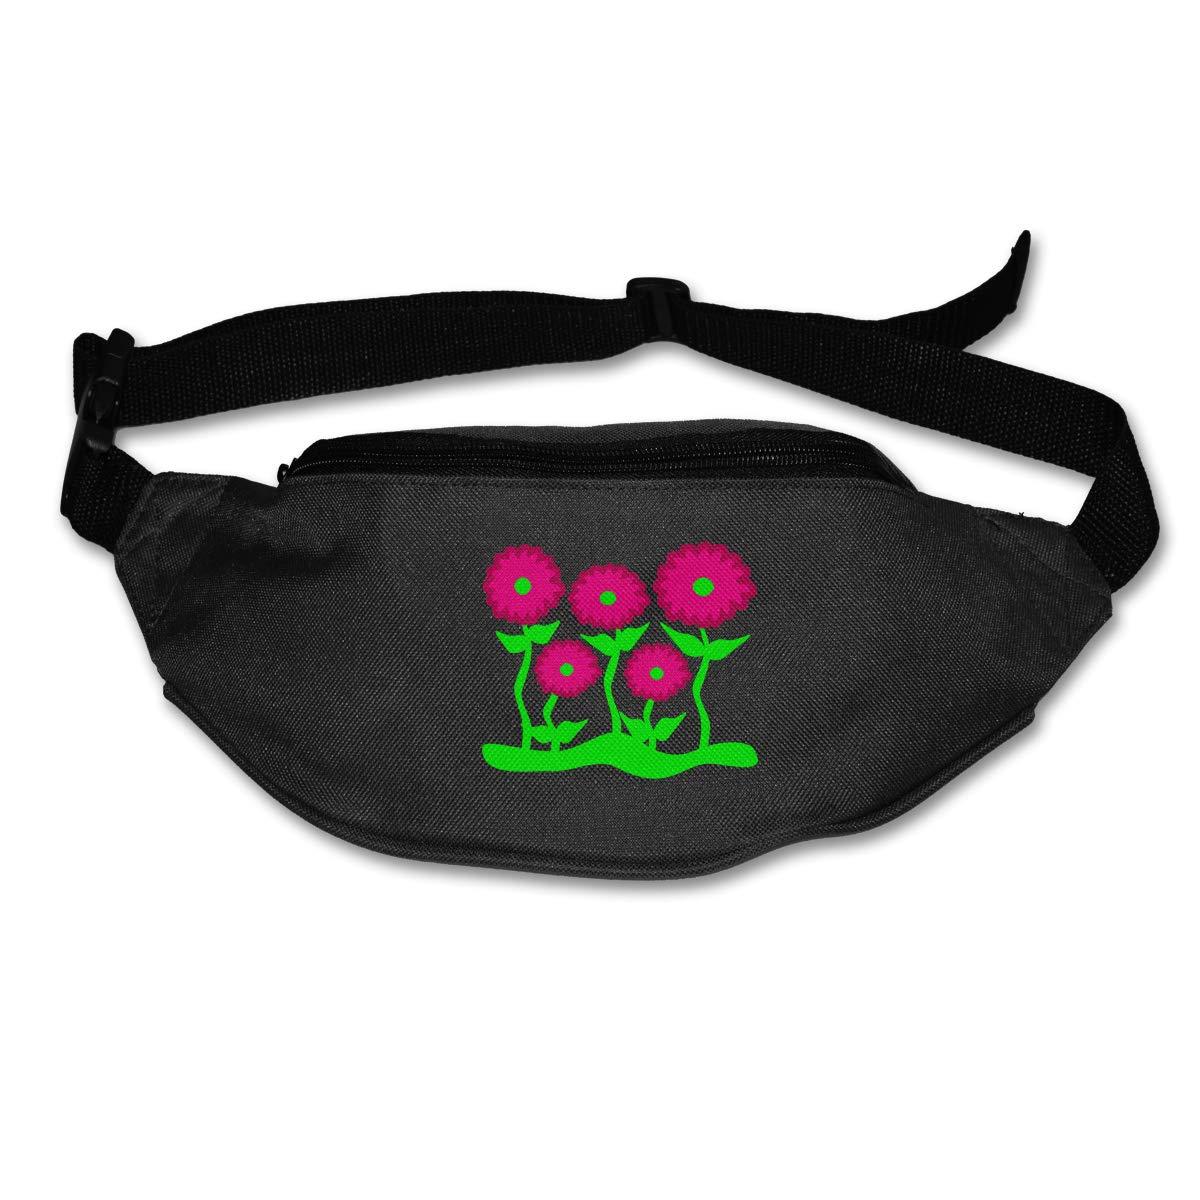 Rose Red Chrysanthemum Sport Waist Bag Fanny Pack Adjustable For Travel